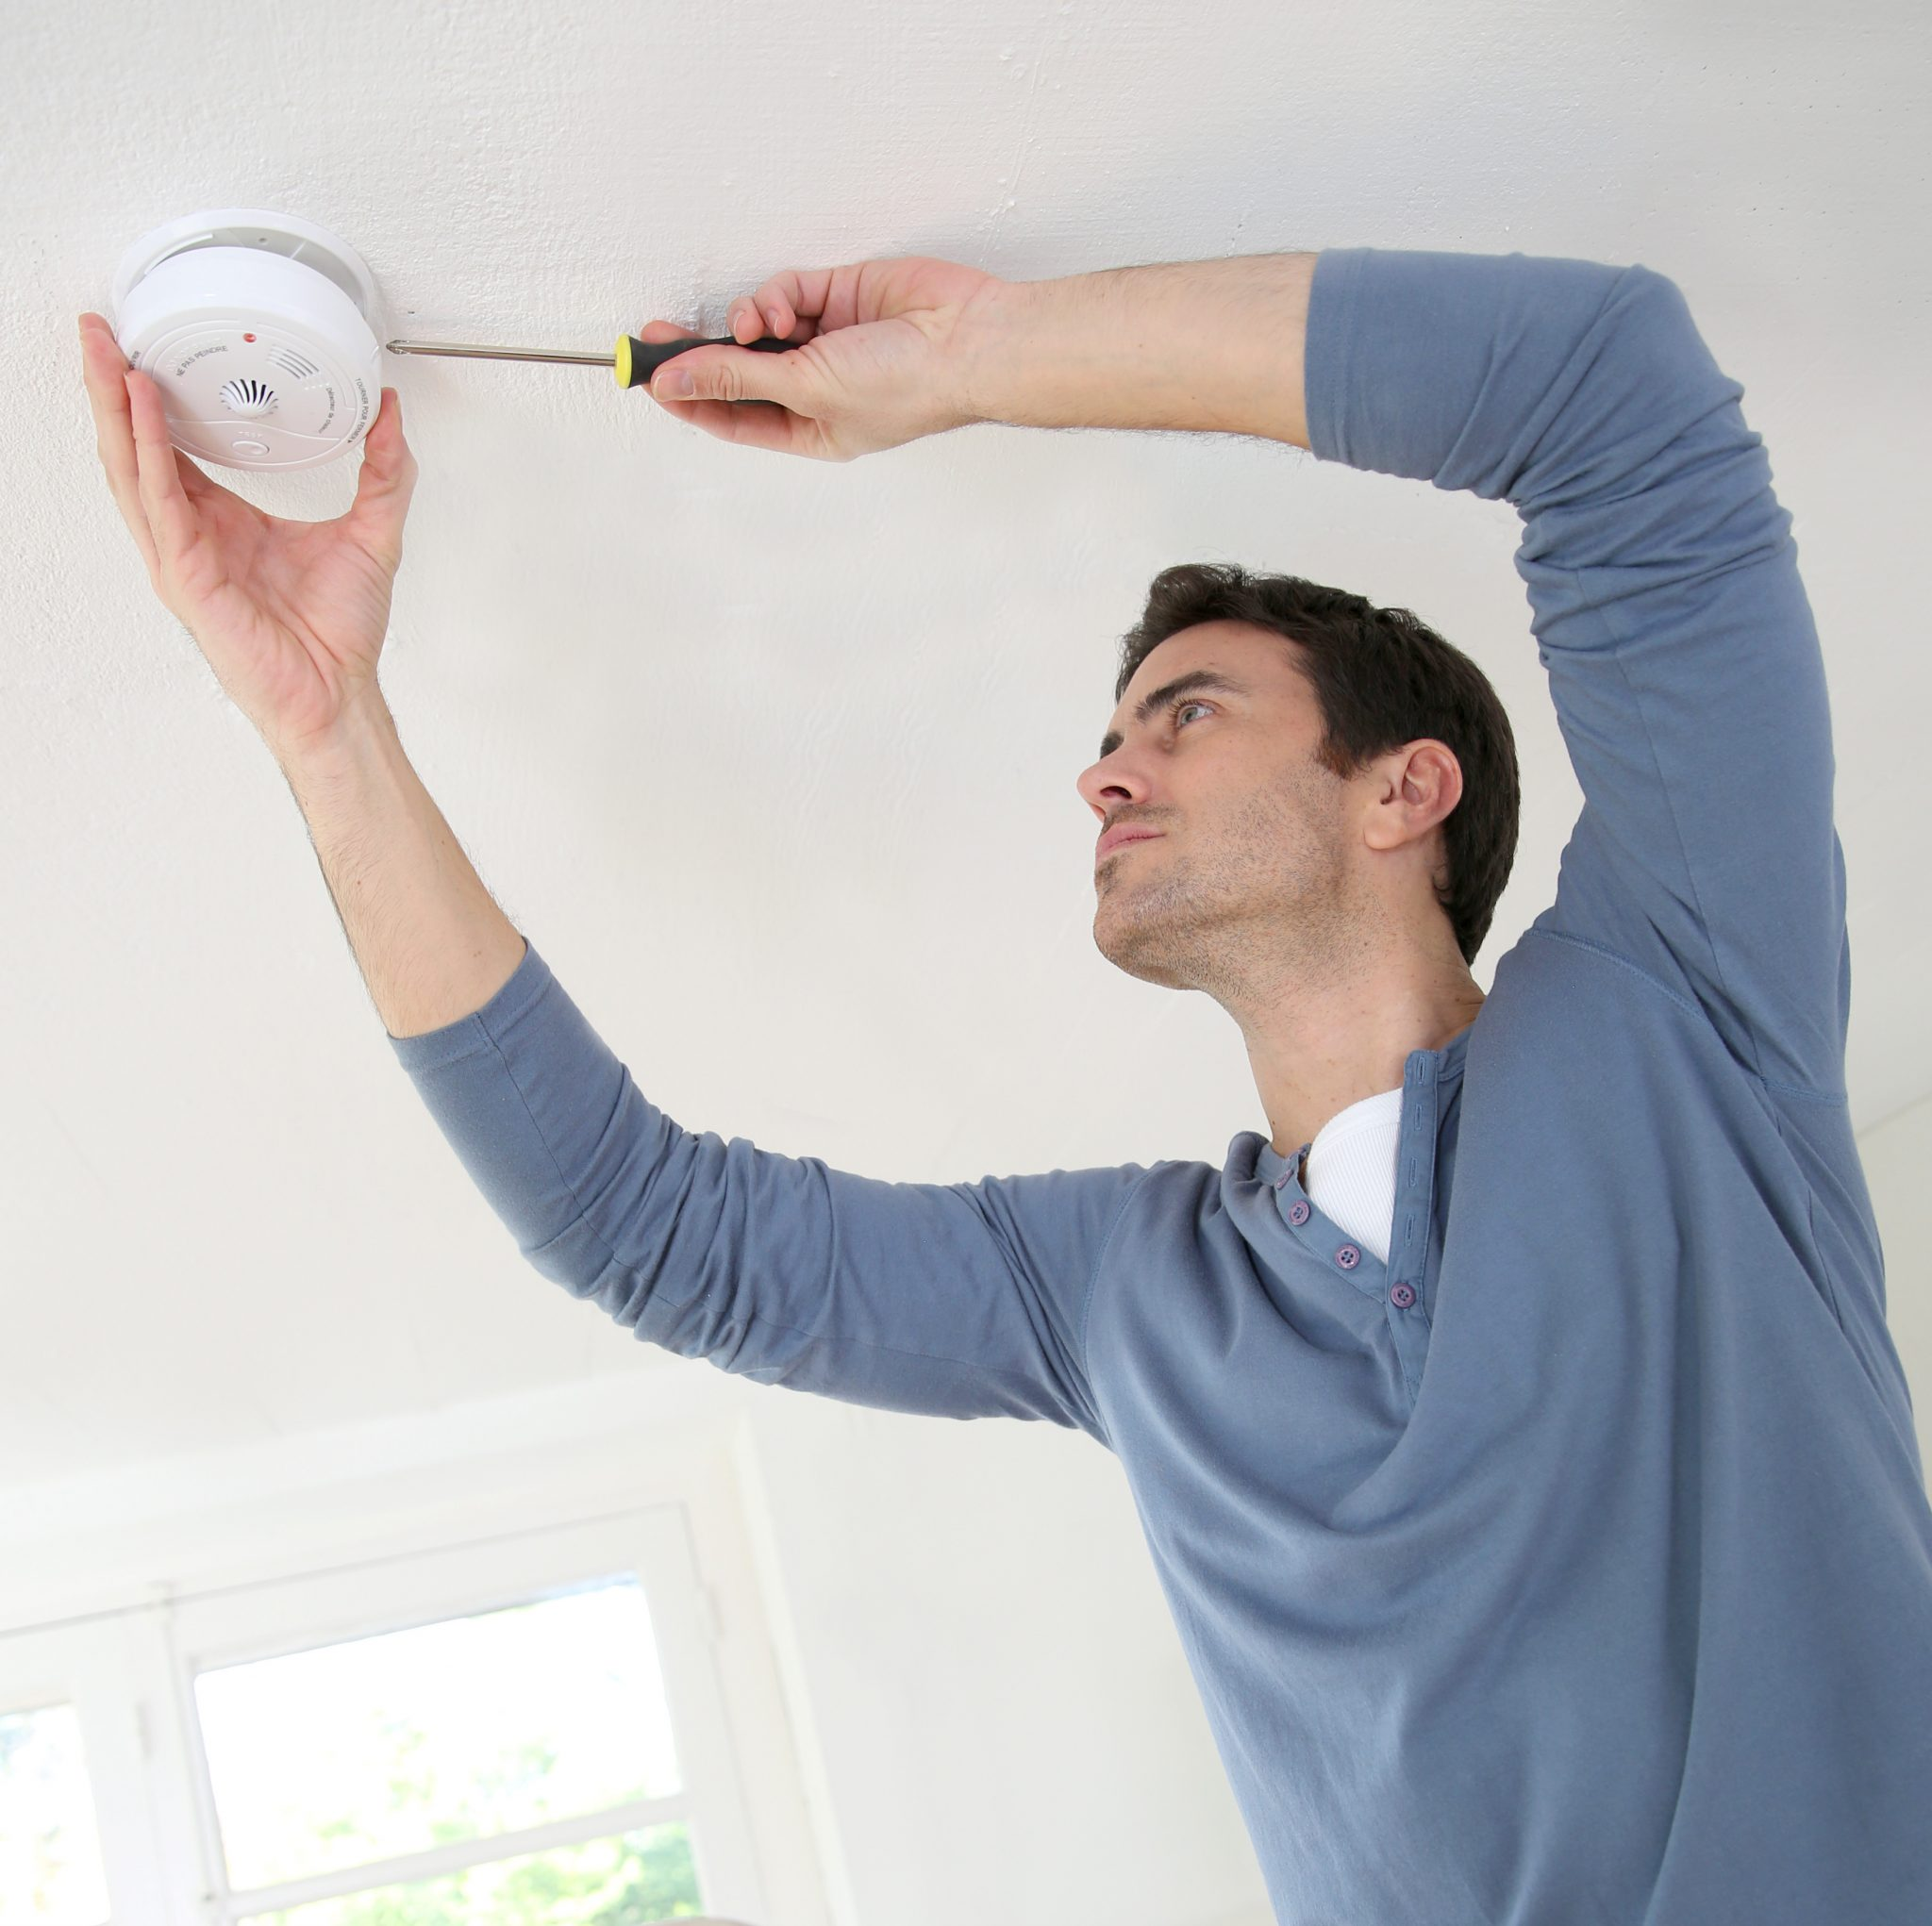 Man installing fire alarm